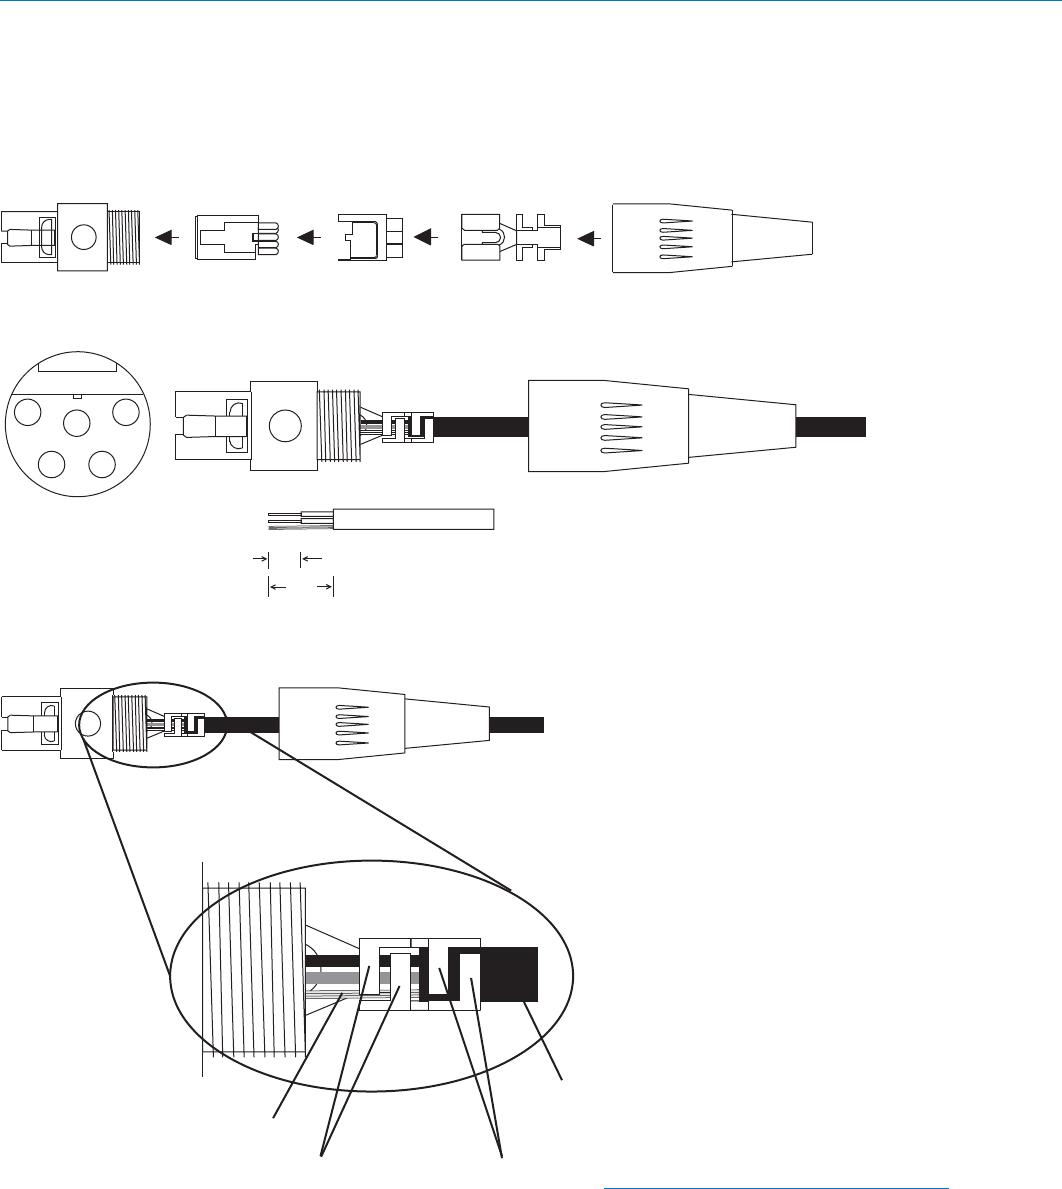 Lectrosonics Lmba1 Wireless Microphone Transmitter User Manual Lmbman Uhf 5pin Input Jack Wiring Digital Hybrid Belt Pack